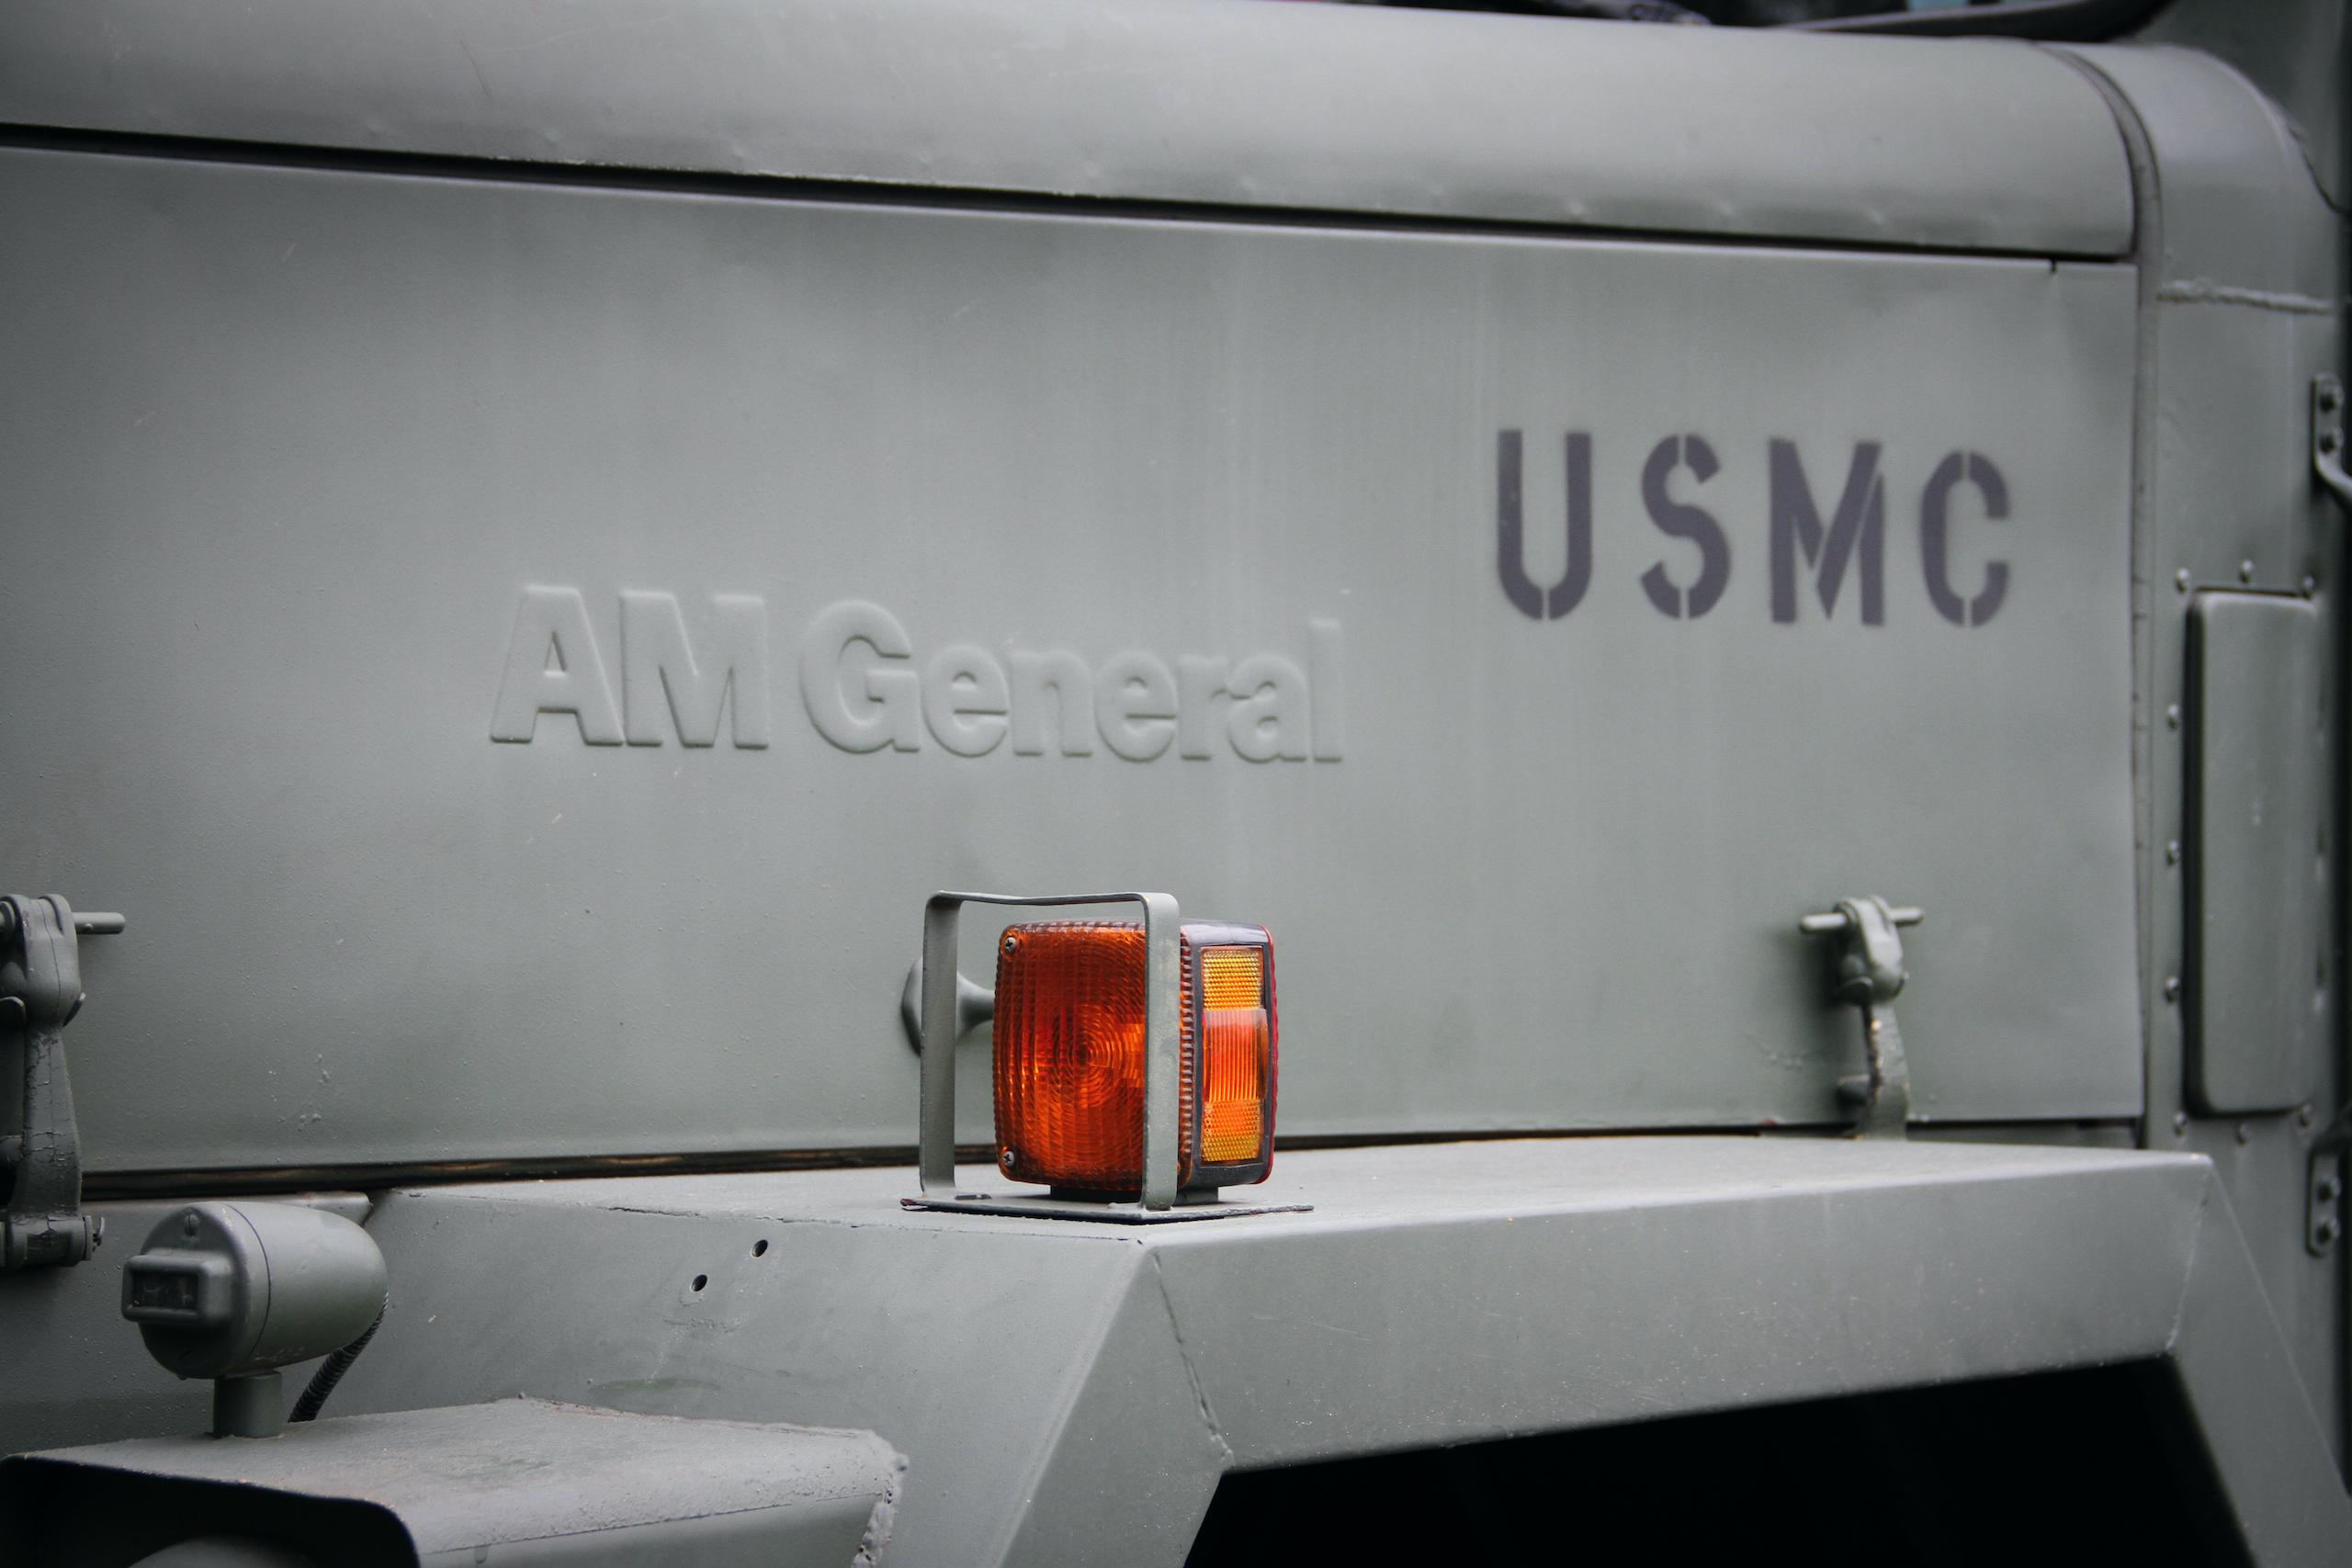 Military vehicle convoy am general usmc